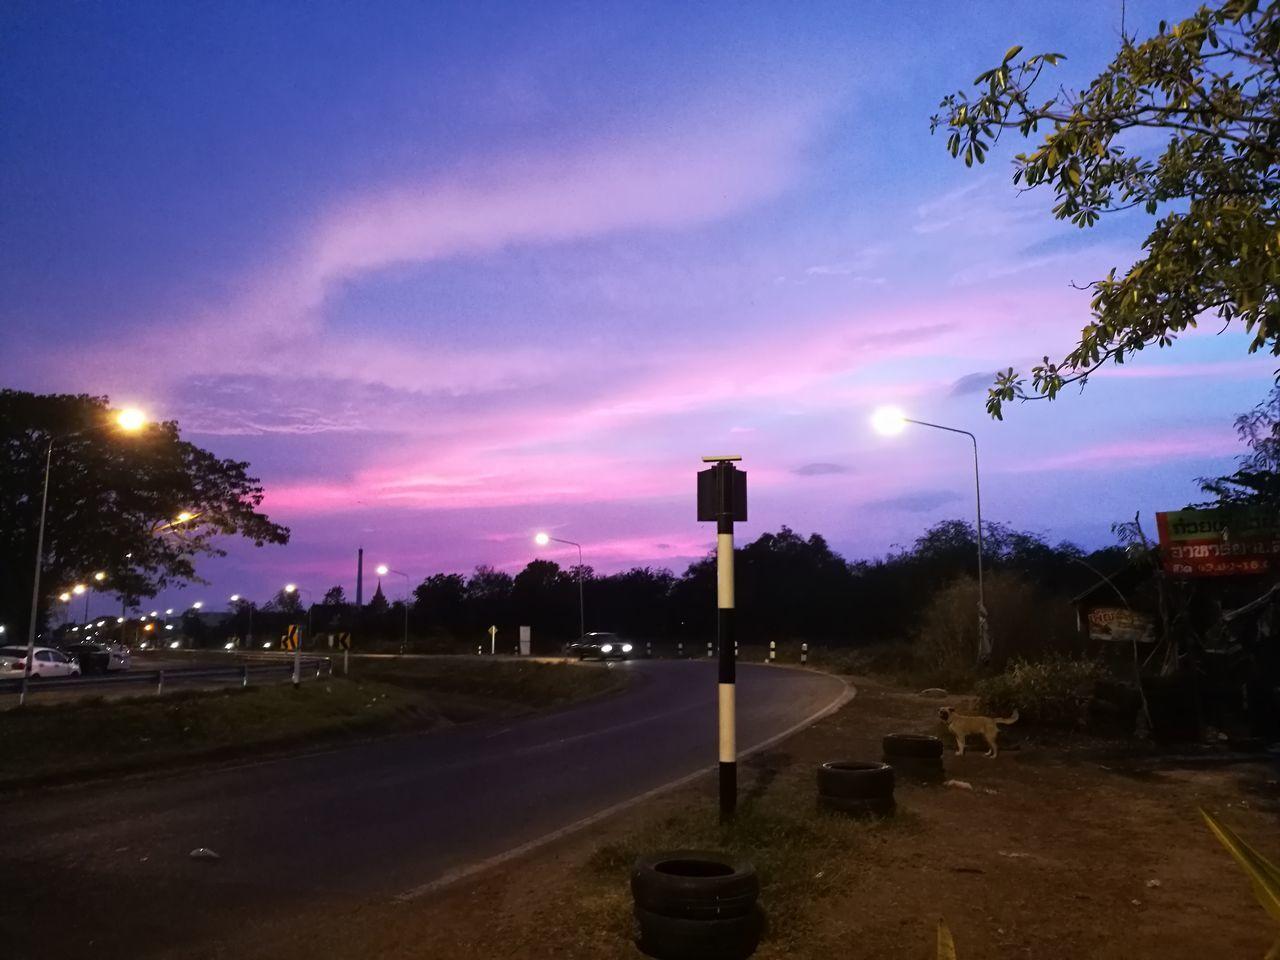 street light, sky, illuminated, tree, outdoors, night, no people, cloud - sky, road, nature